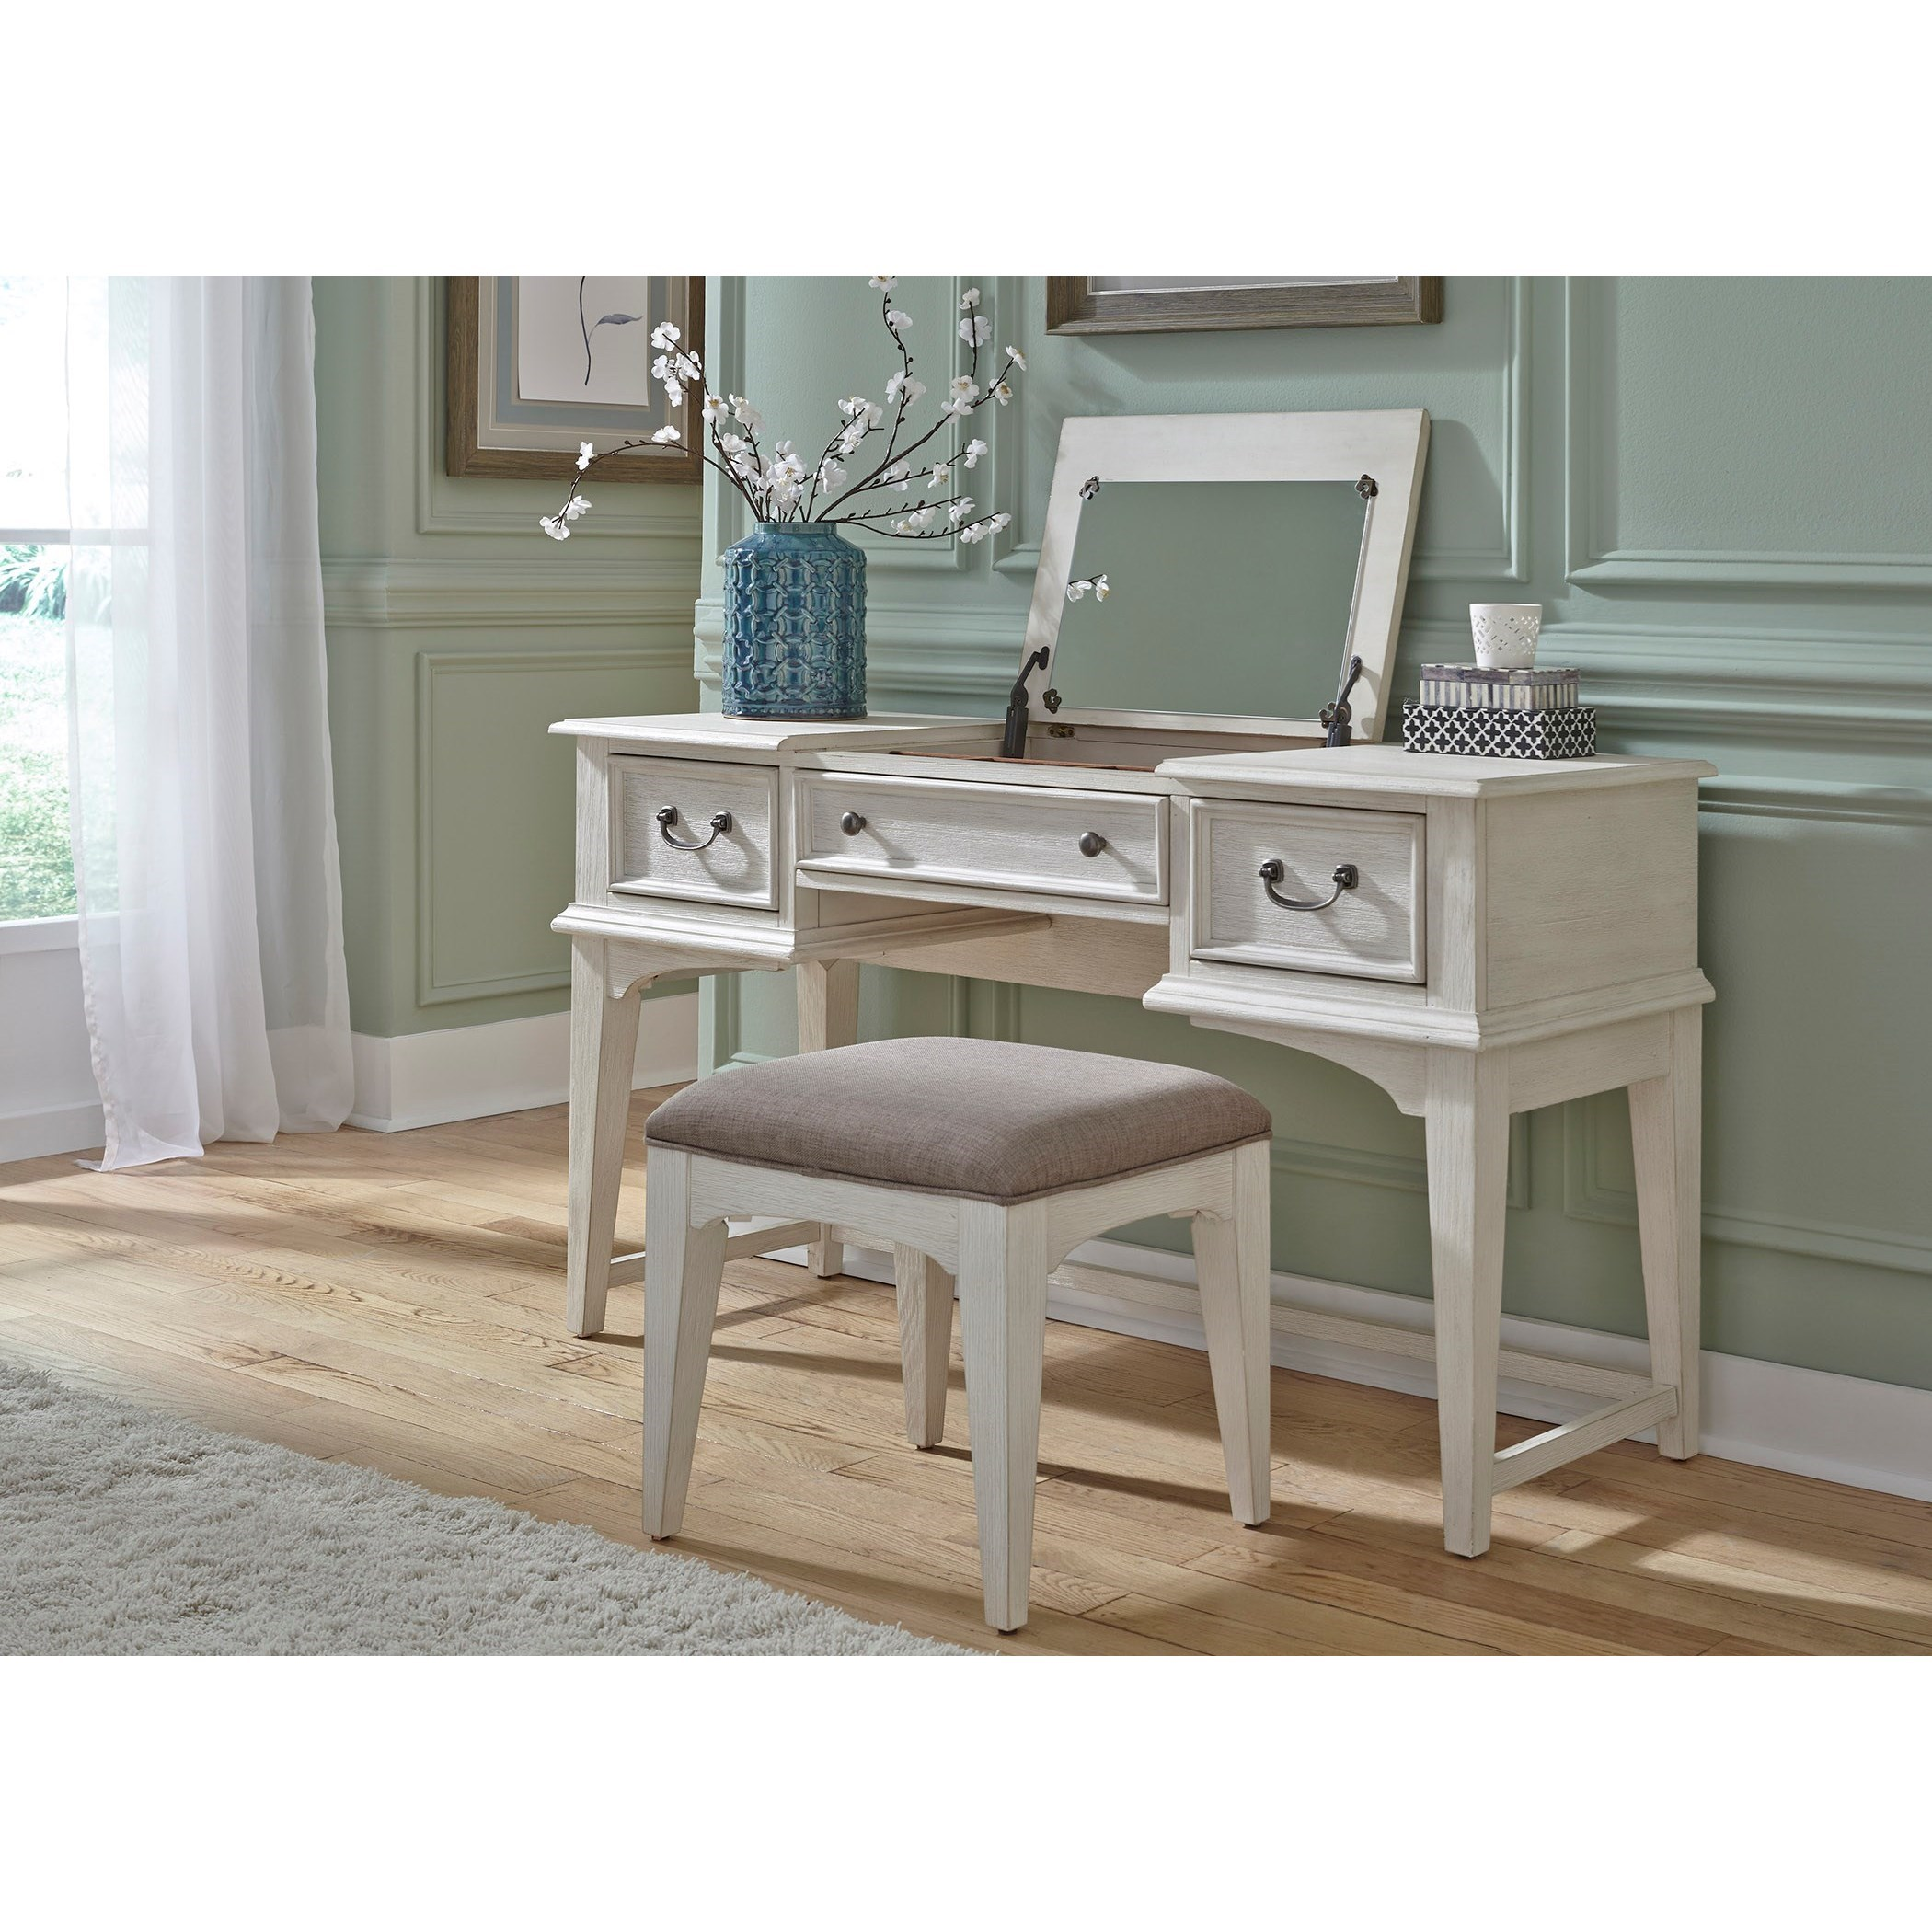 Bayside Bedroom Vanity by Liberty Furniture at Standard Furniture